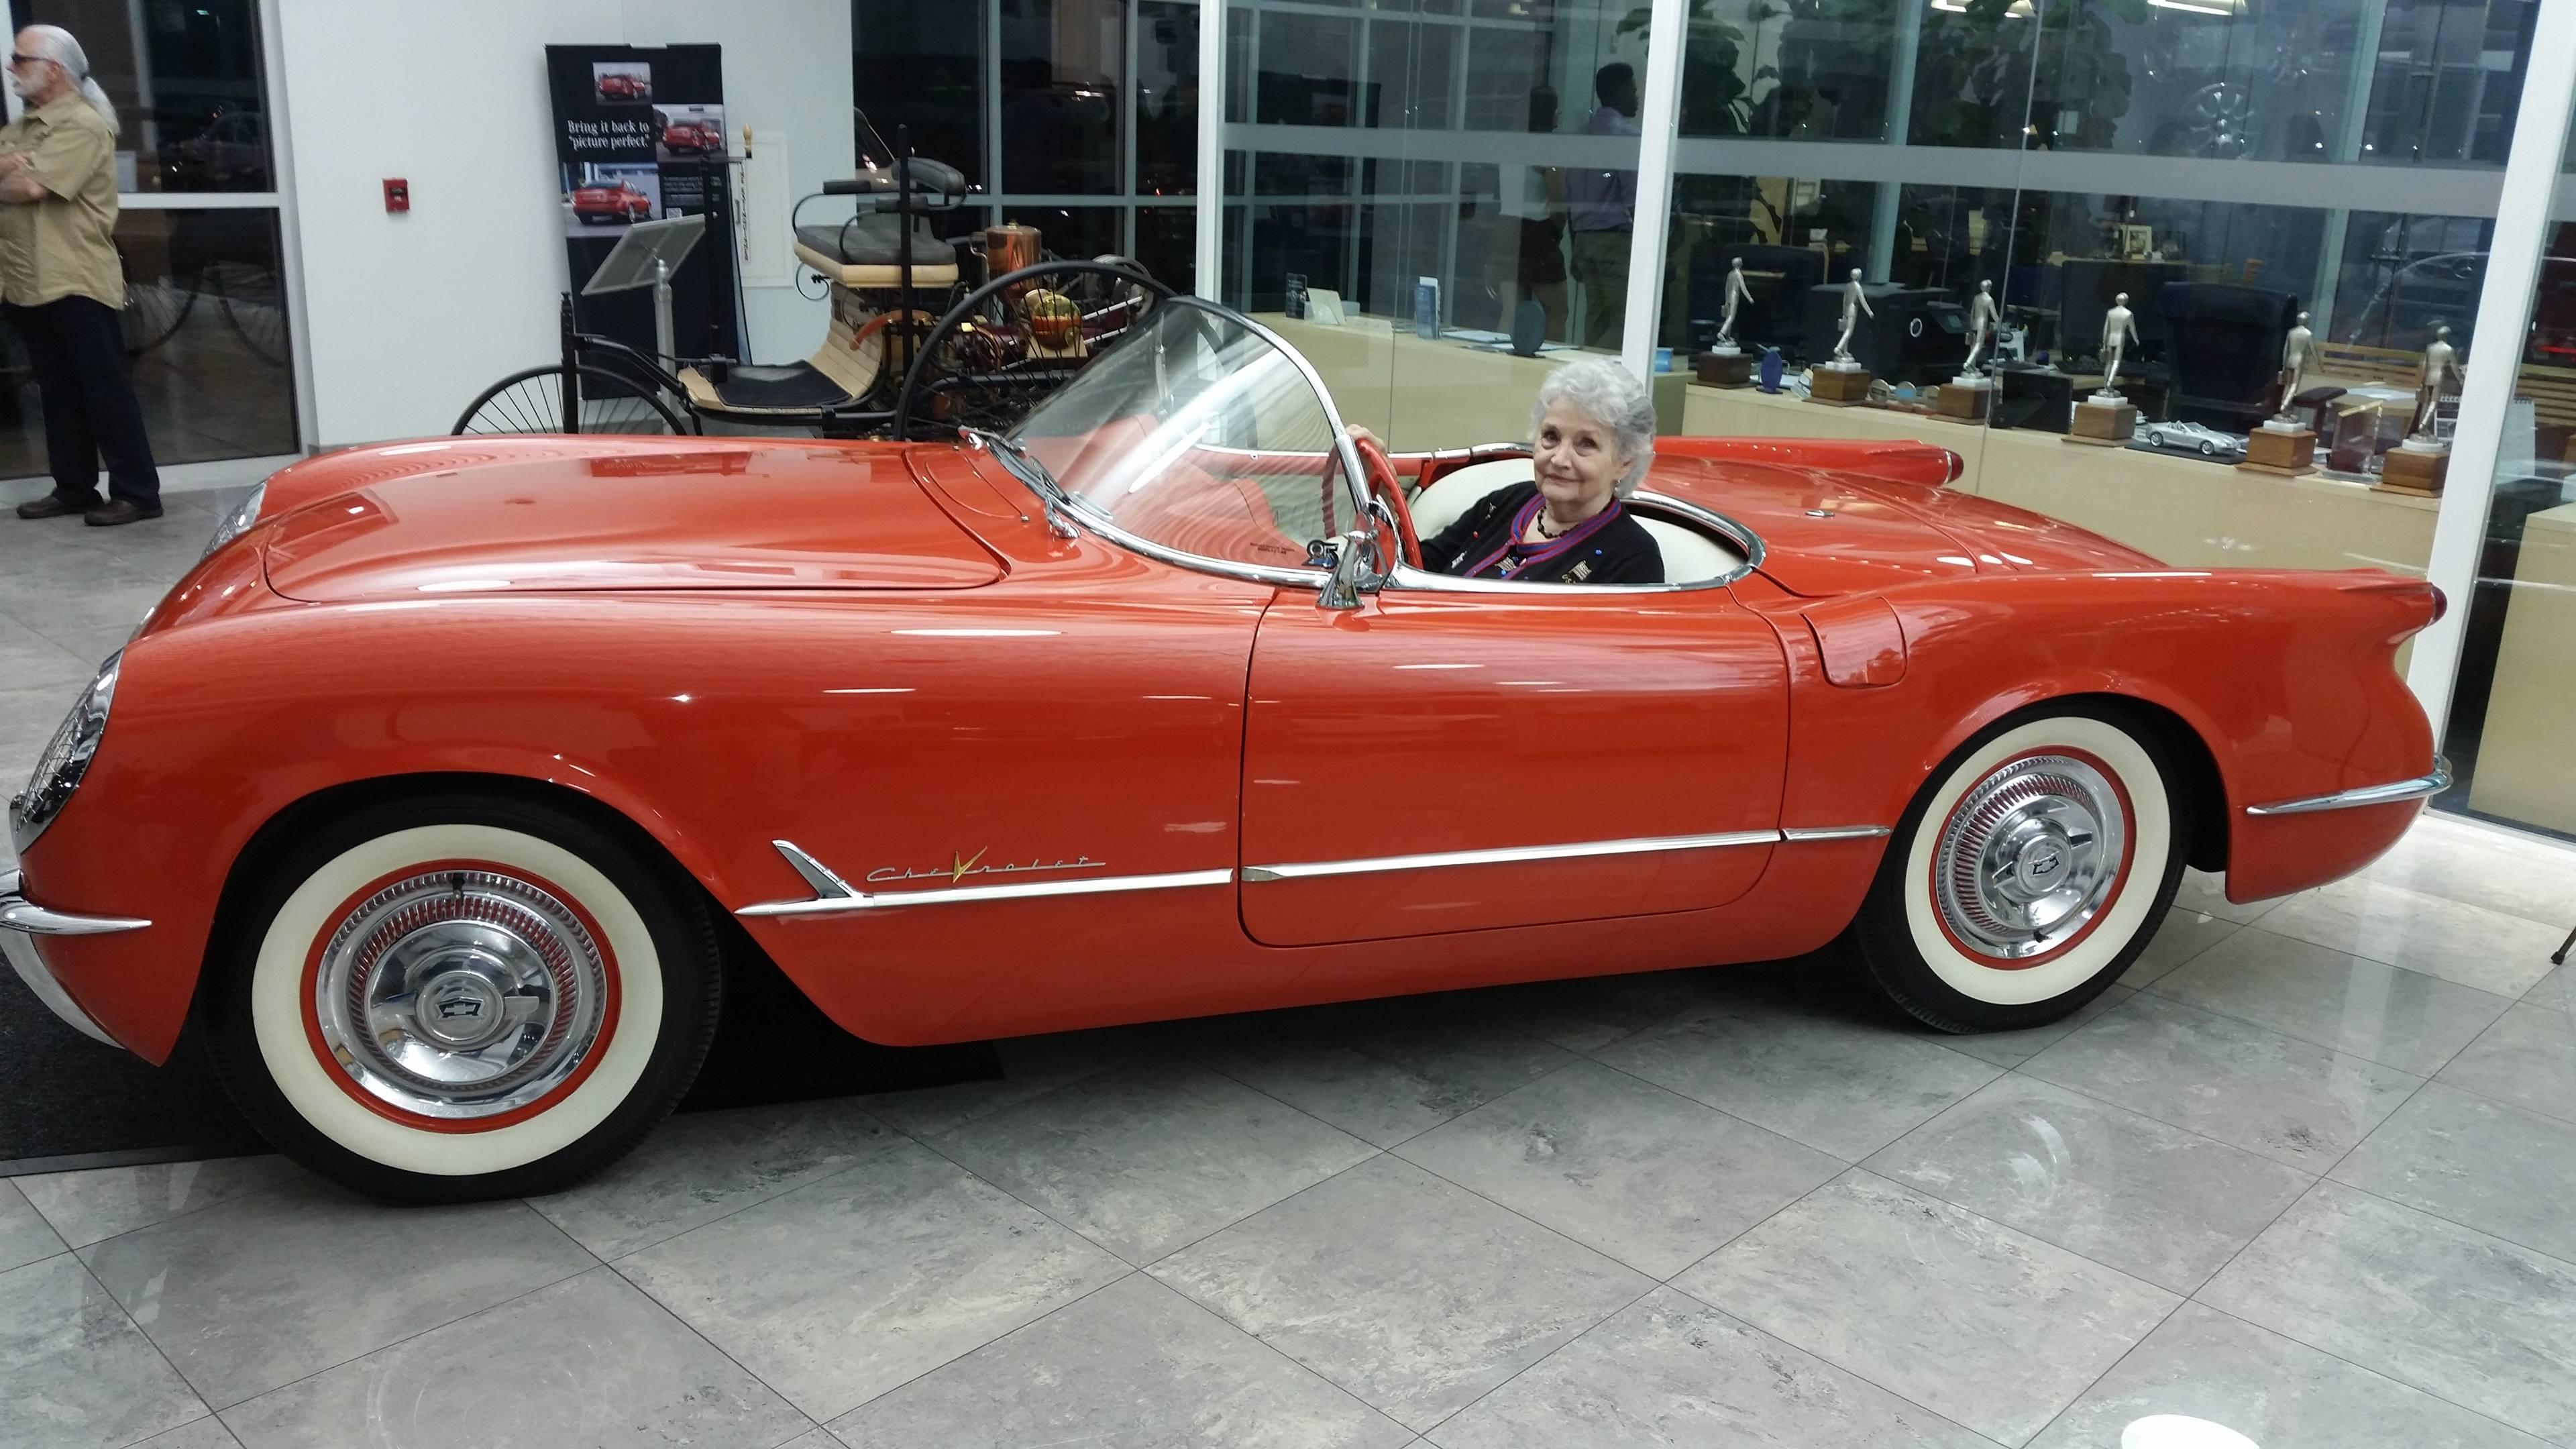 Carolyn Sikes' 1955 Corvette